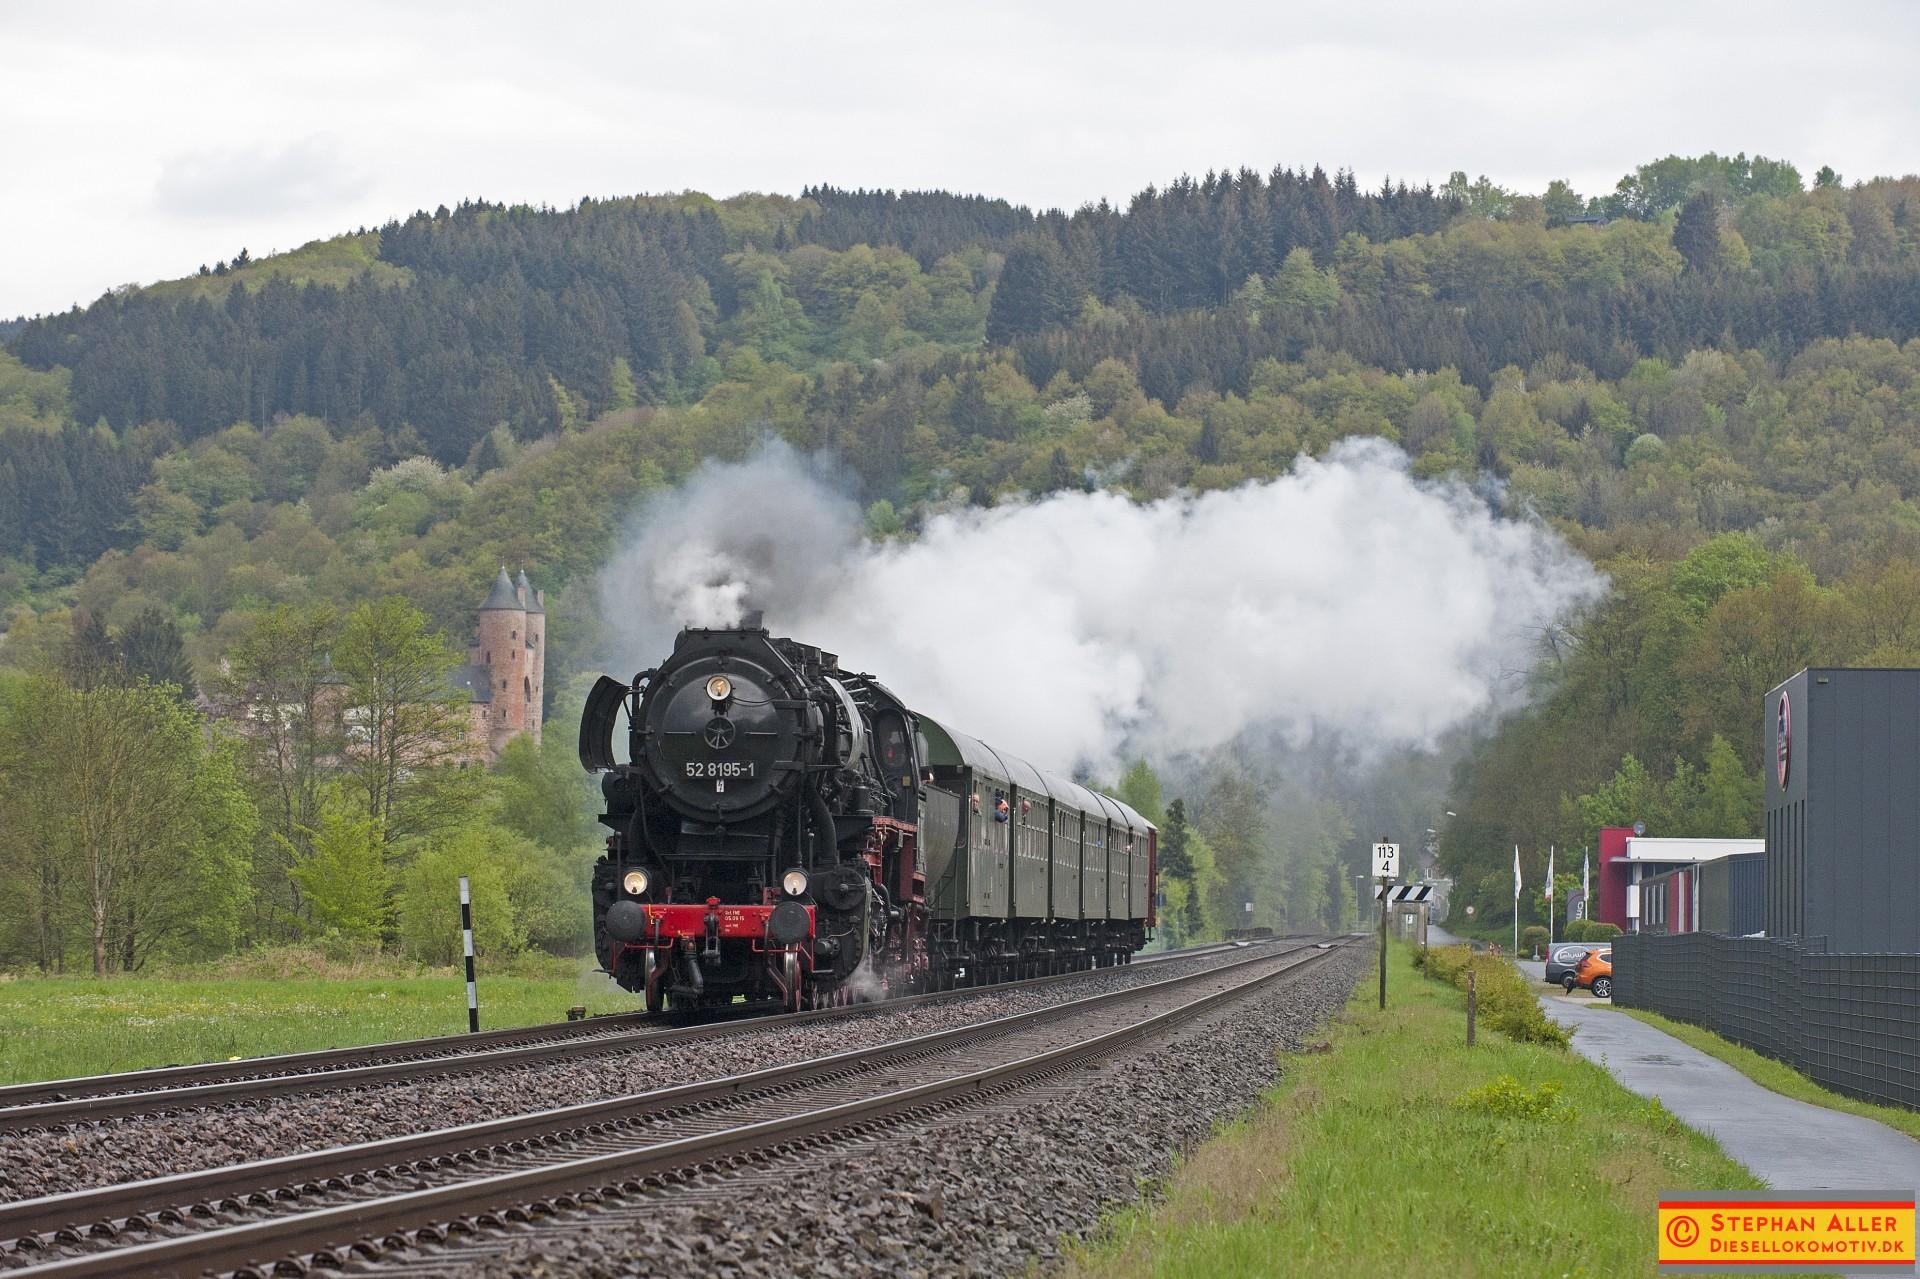 72032r